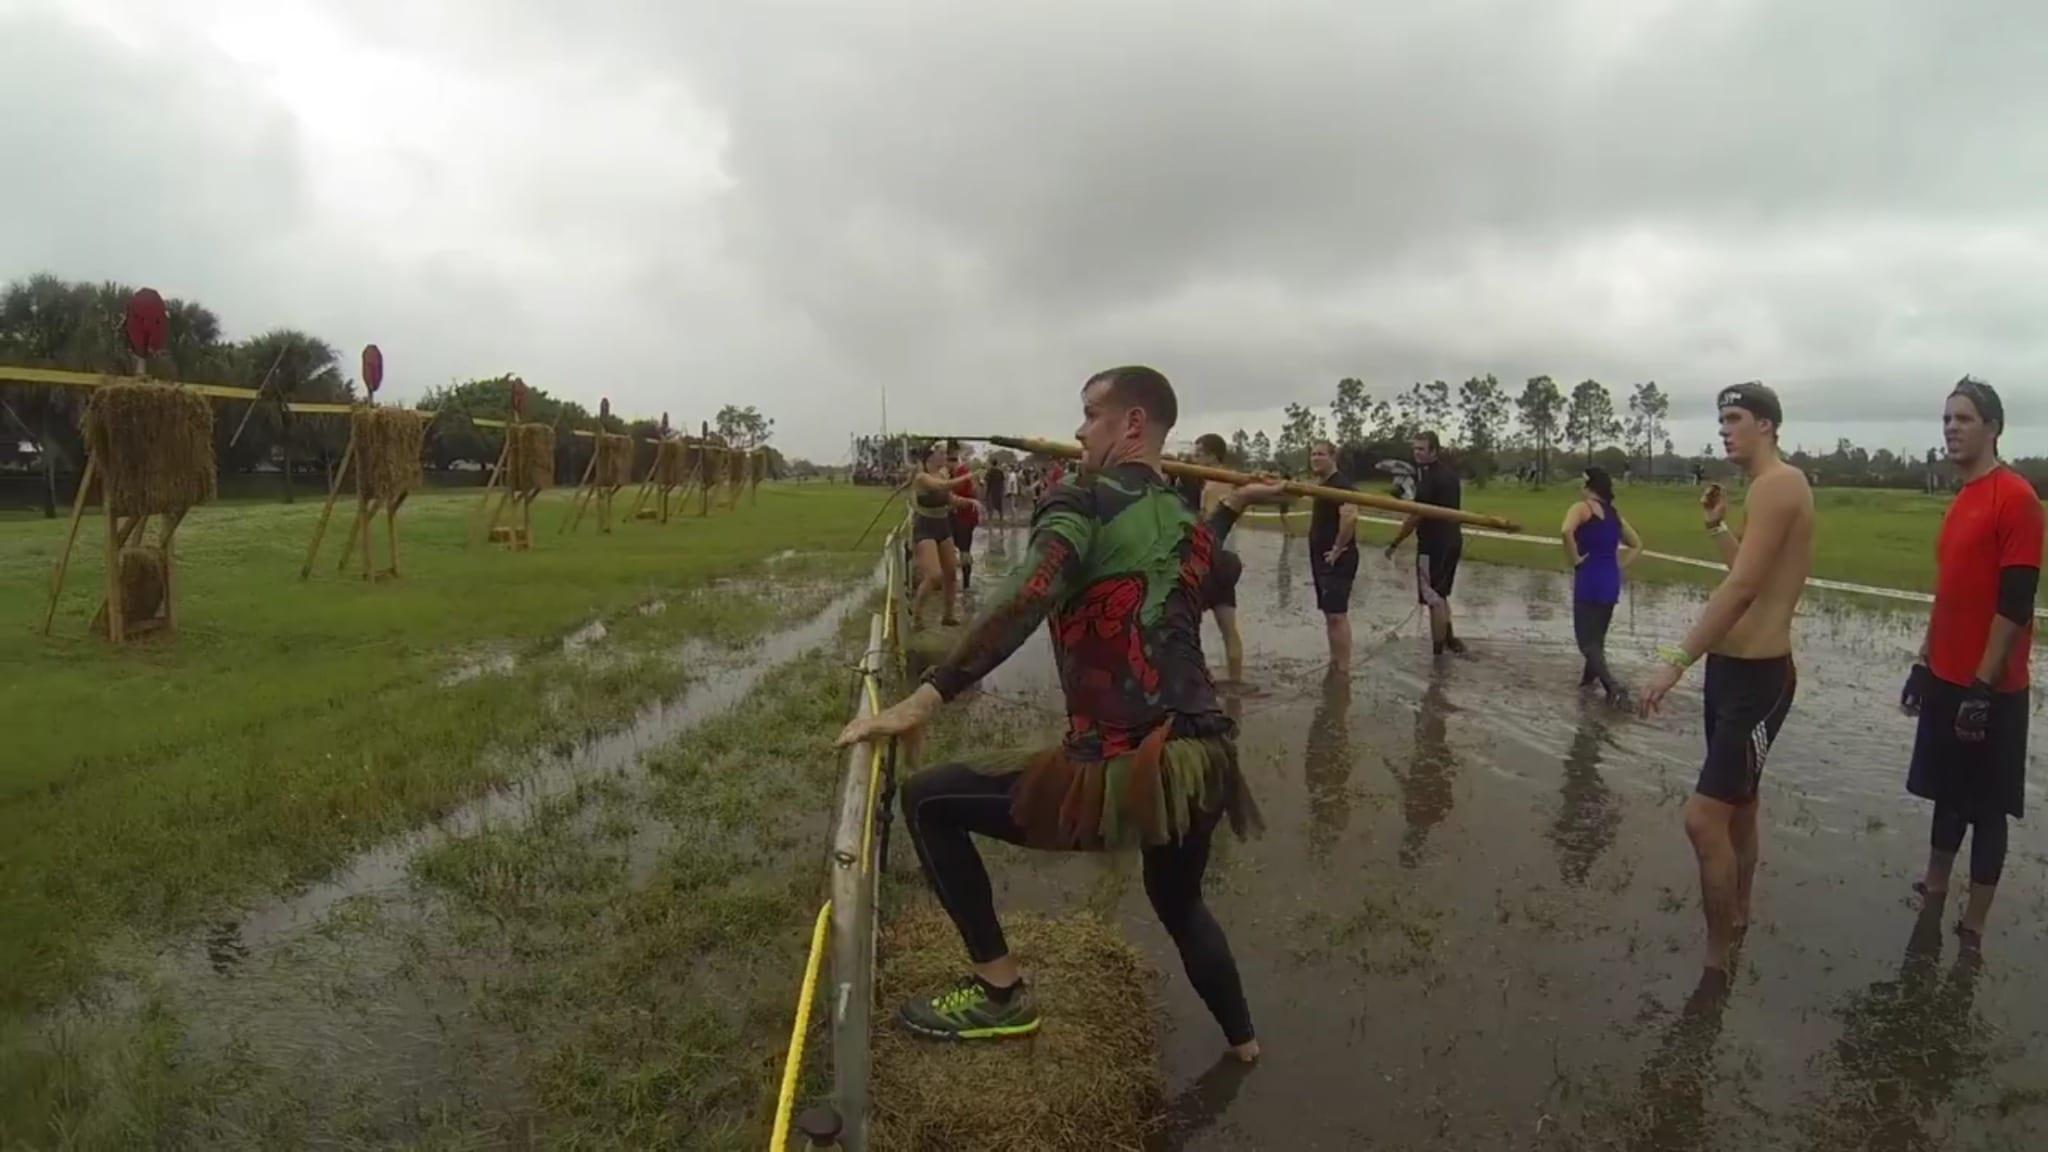 Spartan Race Miami 12052015 - Spear Throw - Courtesy of Arnel Banawa